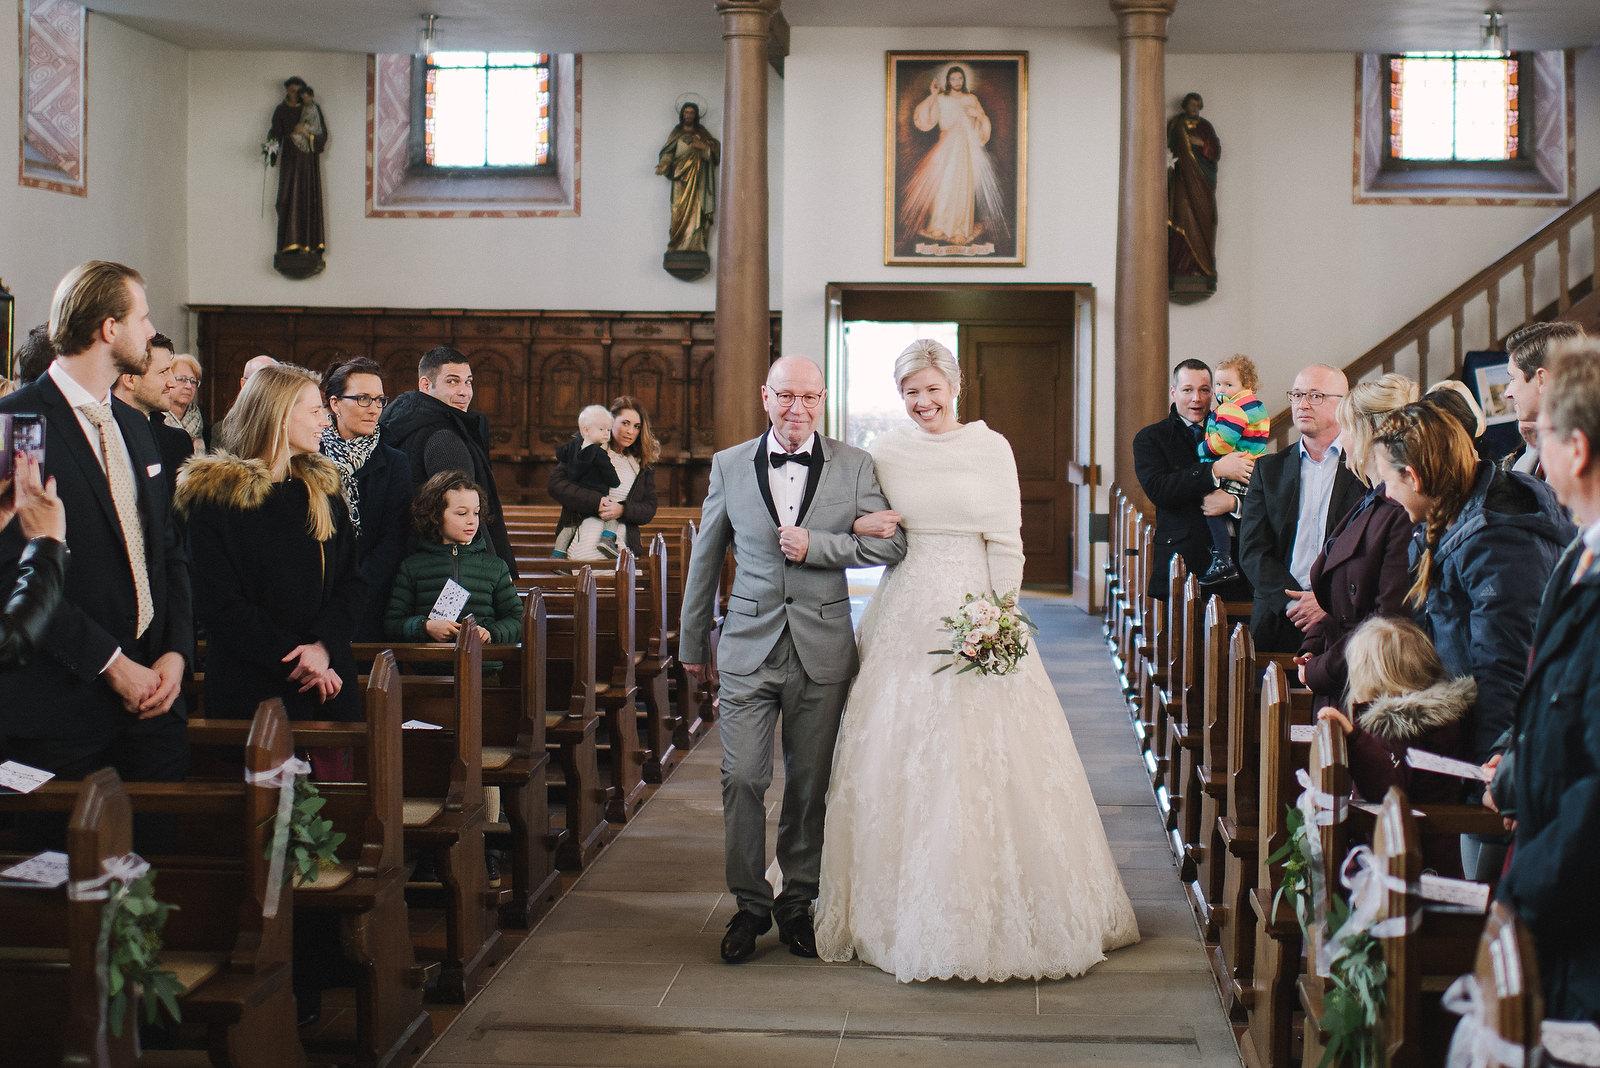 Fotograf Konstanz - Silvester Wedding in Hagnau / Friedrichshafen at Lake of Constance  - 7 -